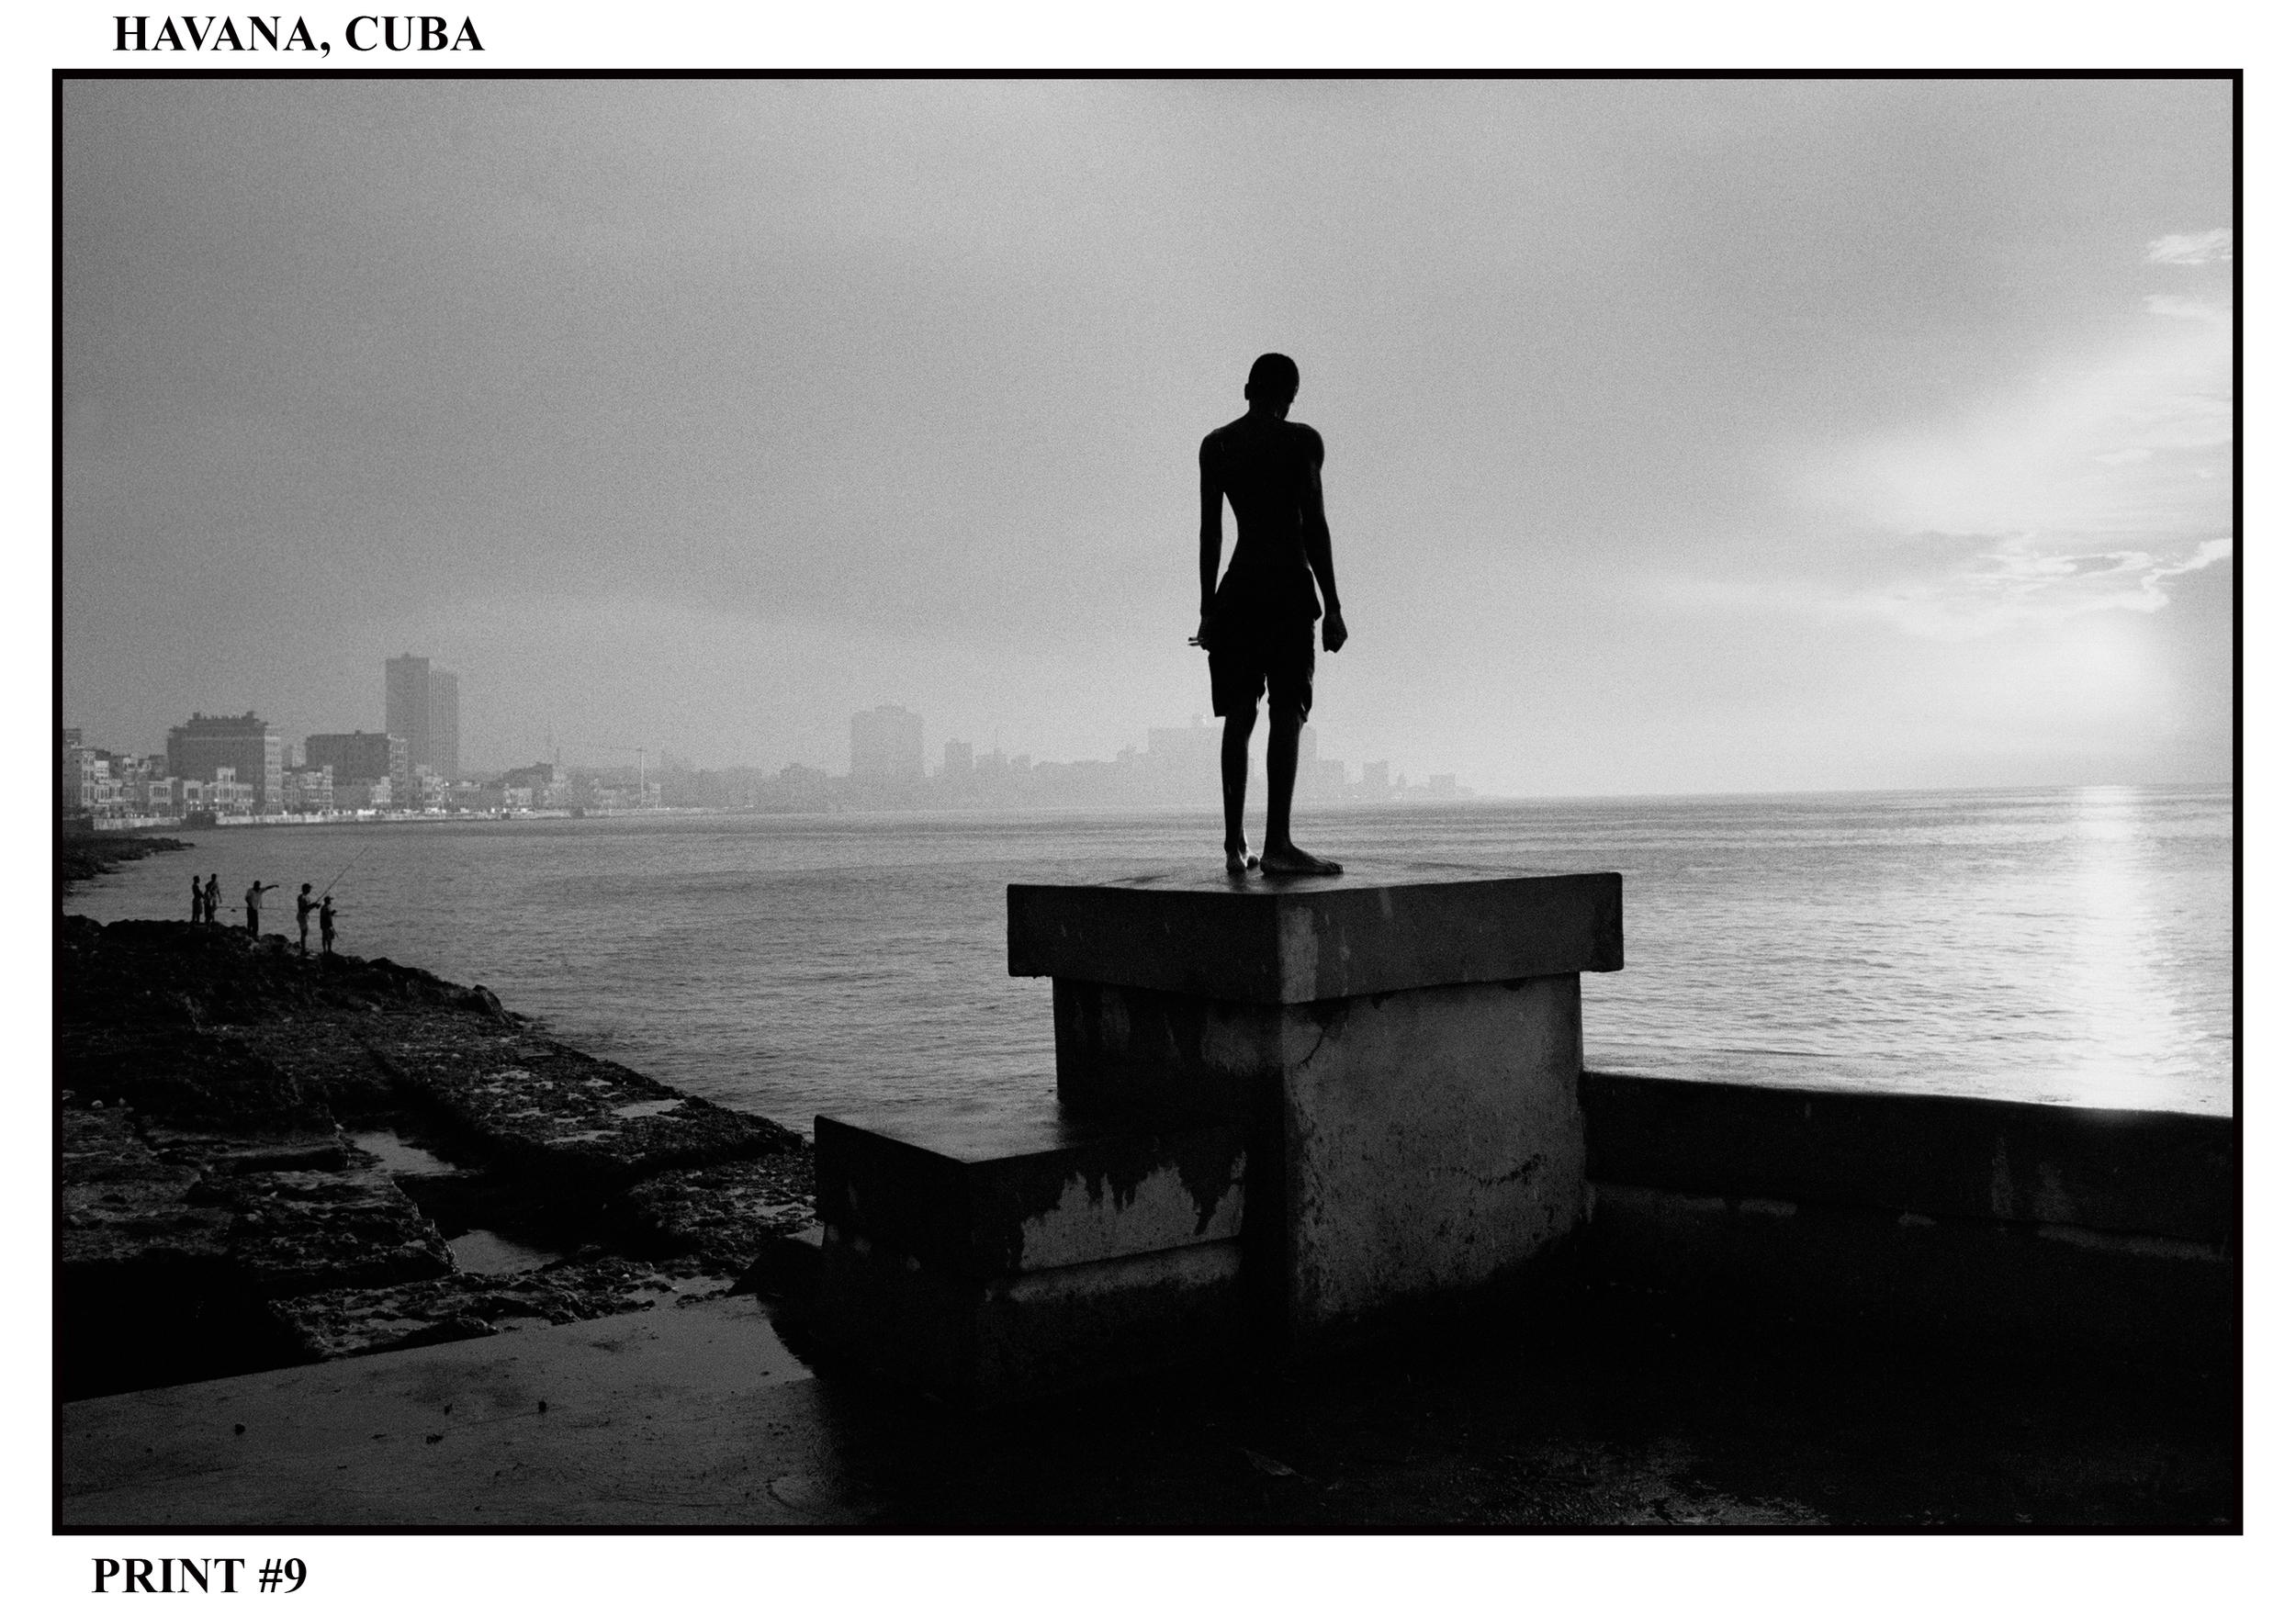 009HAVANA, CUBA copy.jpg